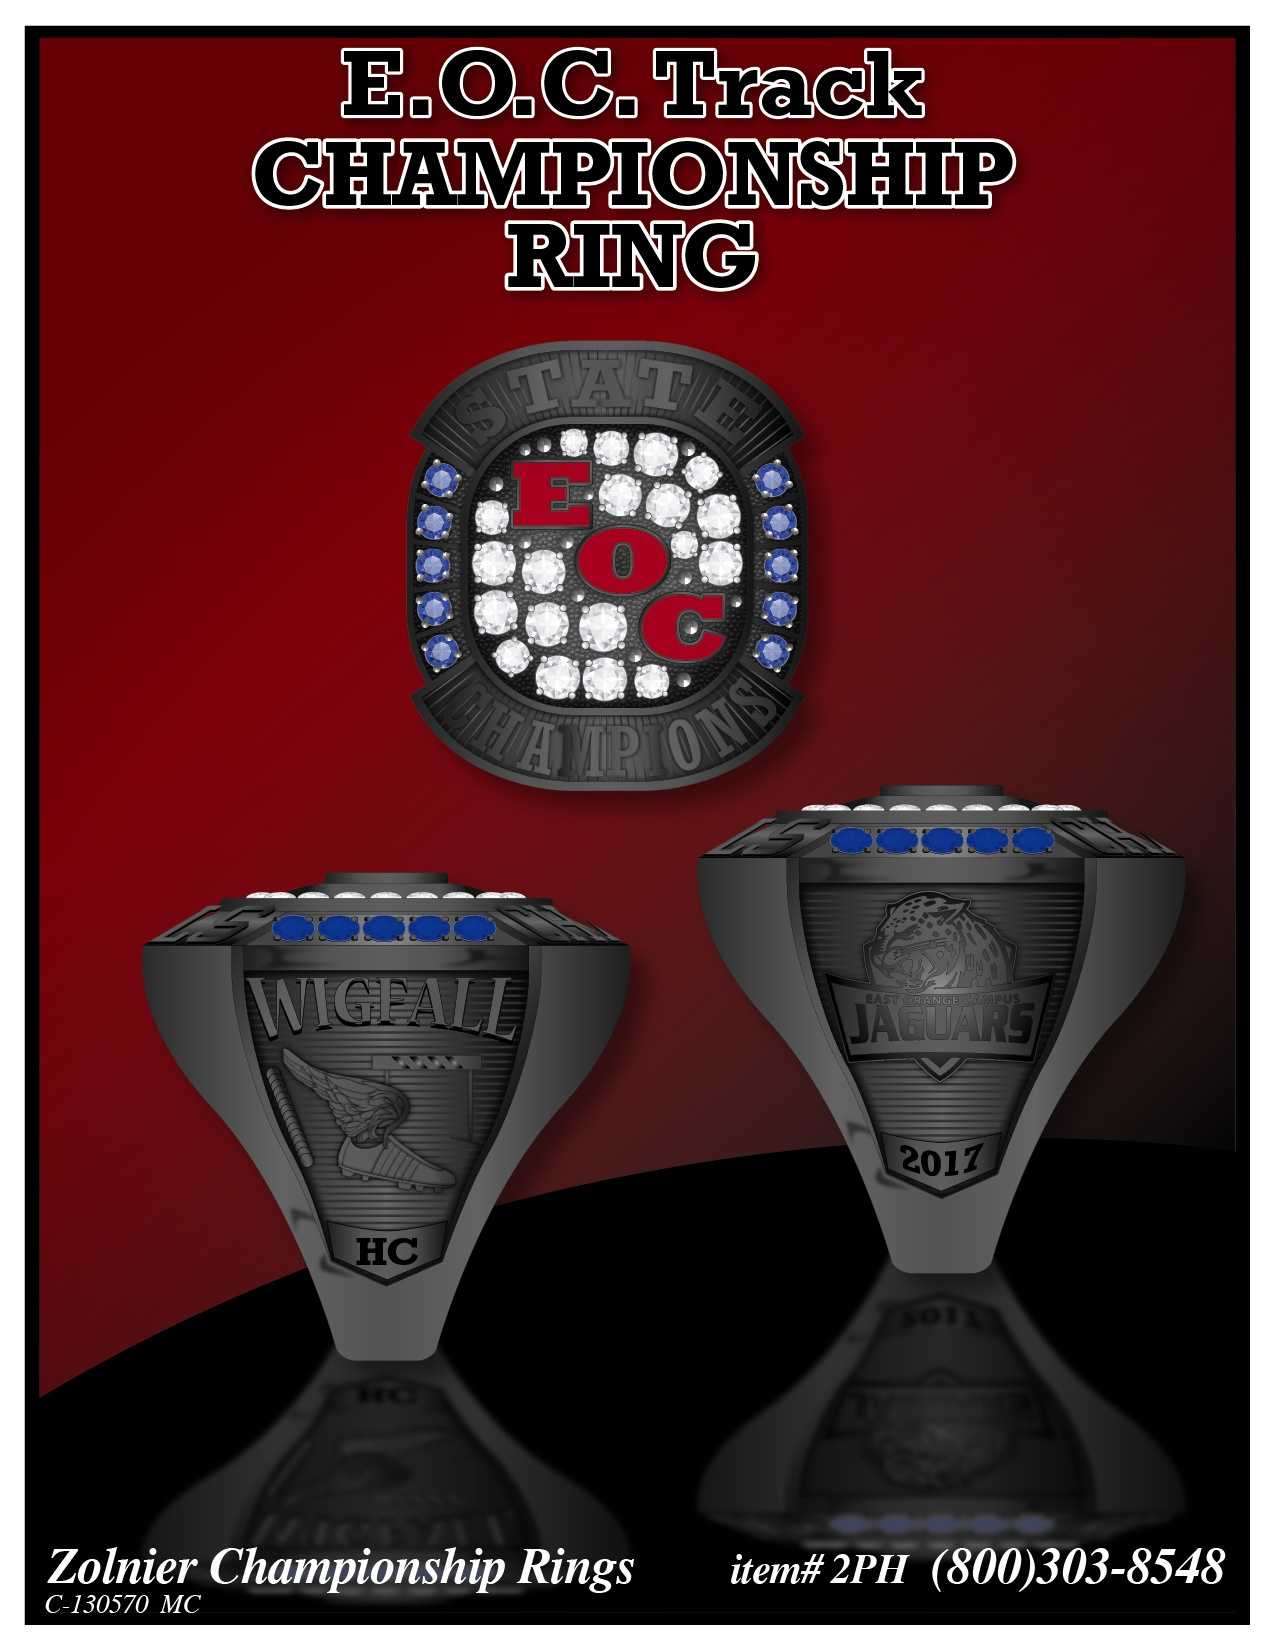 C-130570 EOC Track Championship Ring - Copy